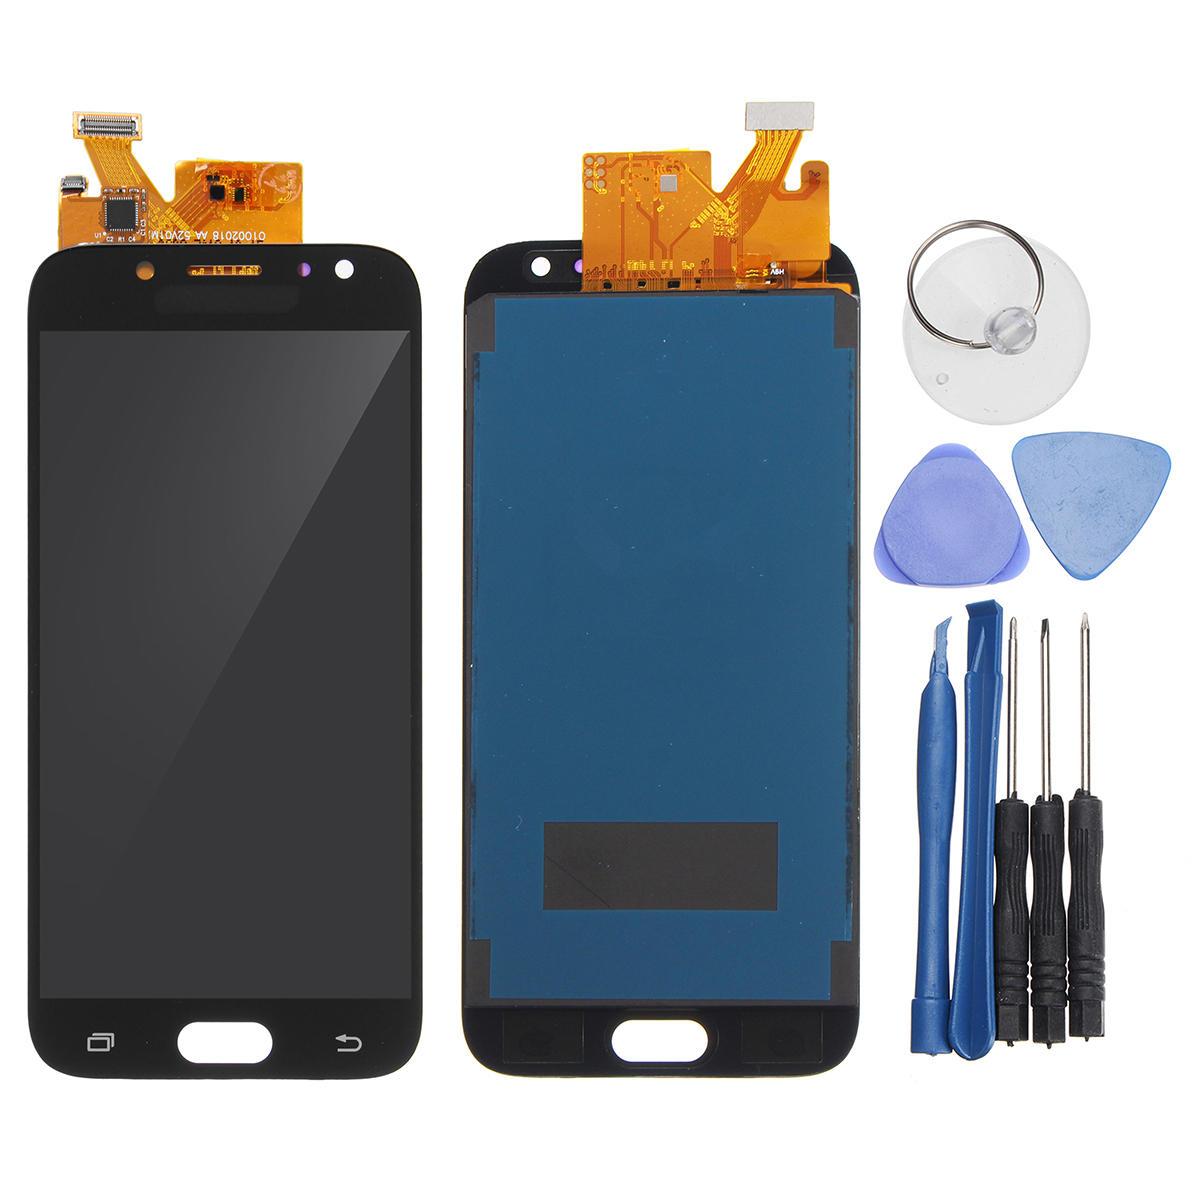 LCD Дисплей Сенсорный экран планшета Замена с Набор для Samsung Galaxy J5 Pro 2017 J530 J530F